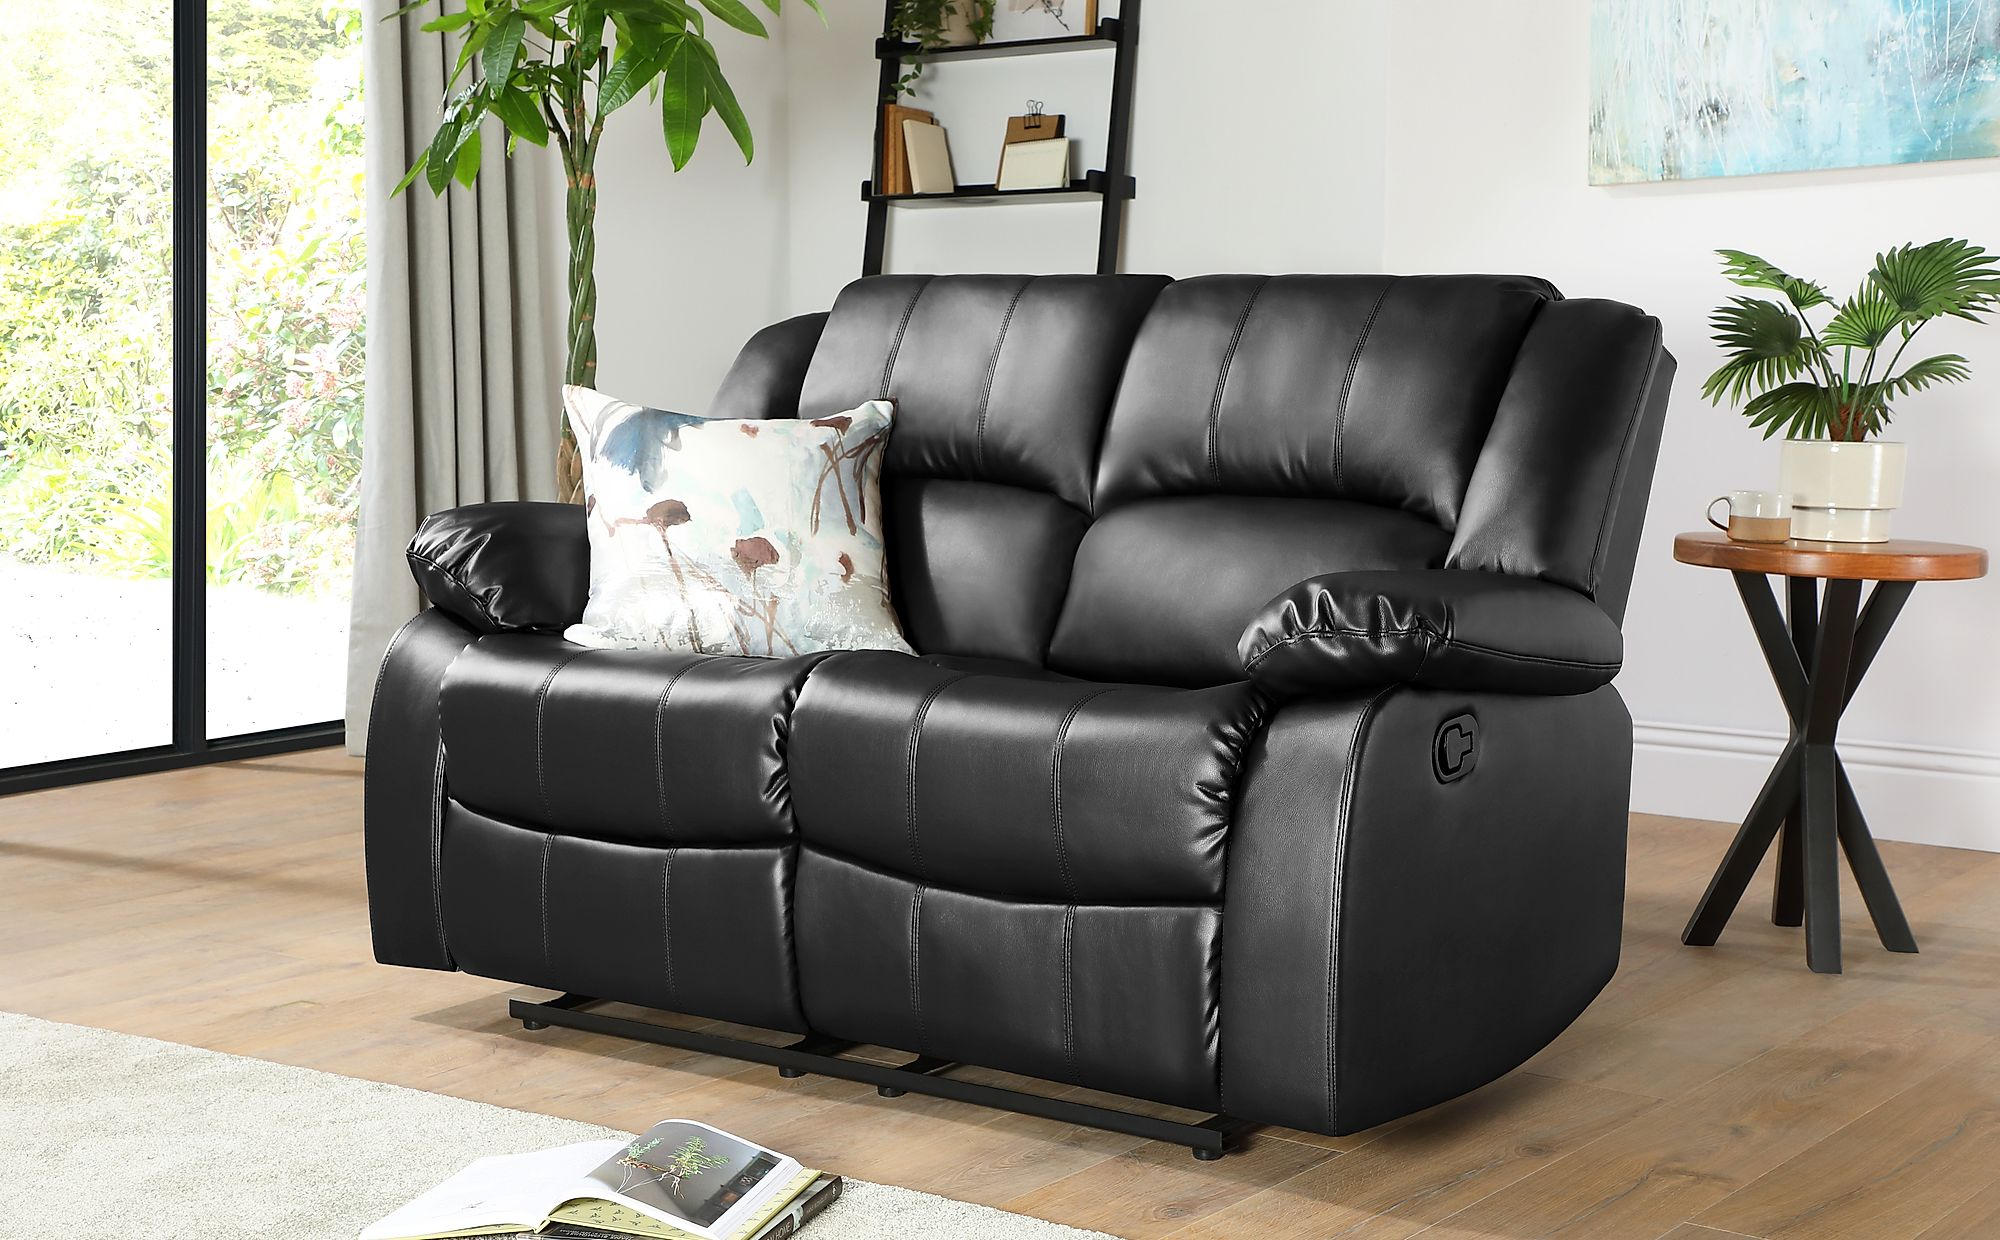 Dakota 2 Seater Leather Recliner Sofa Black Only 449 99